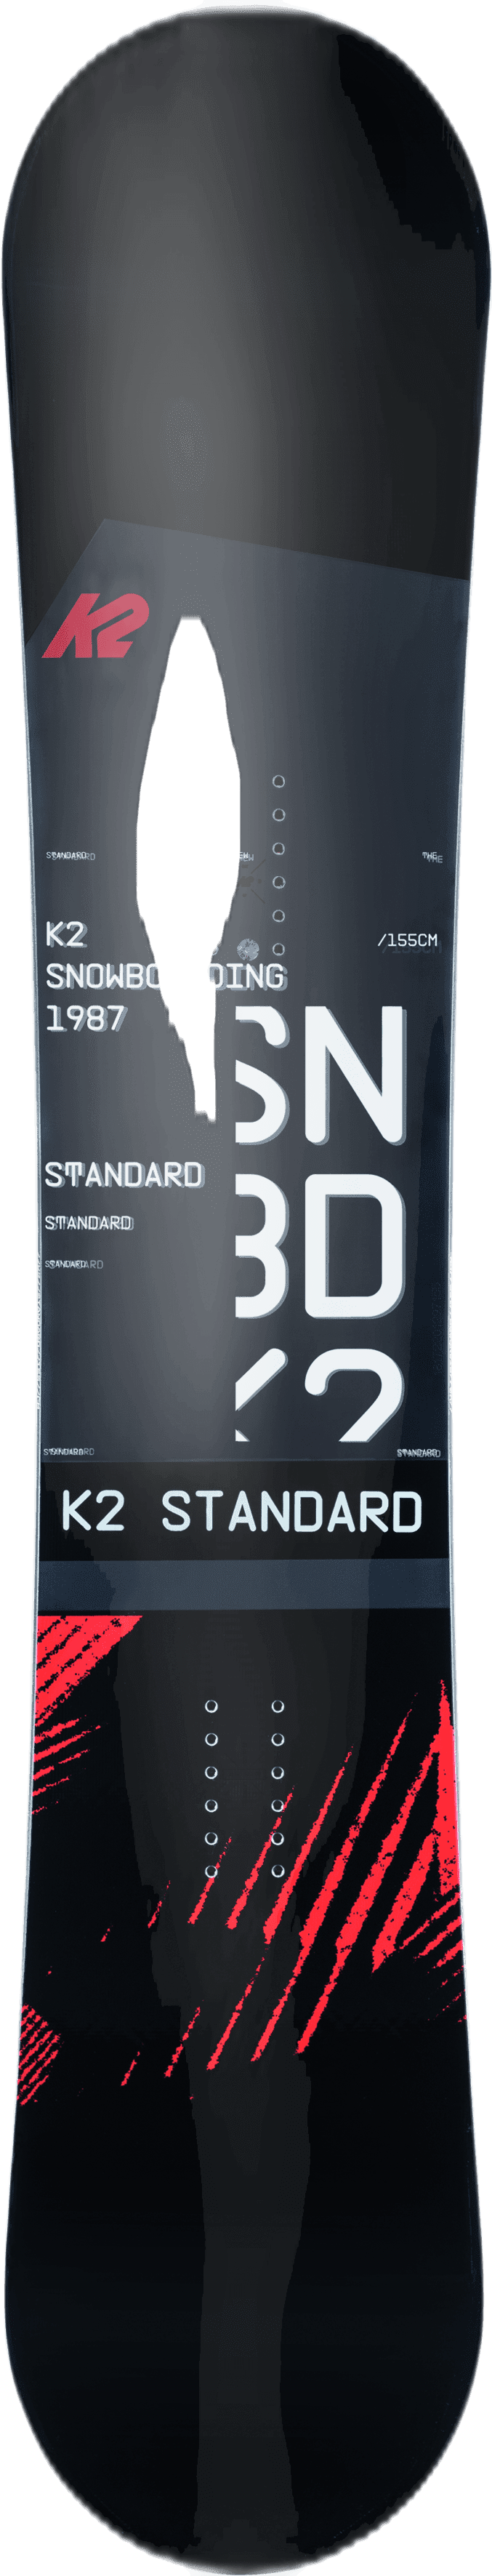 K2 standard u 152